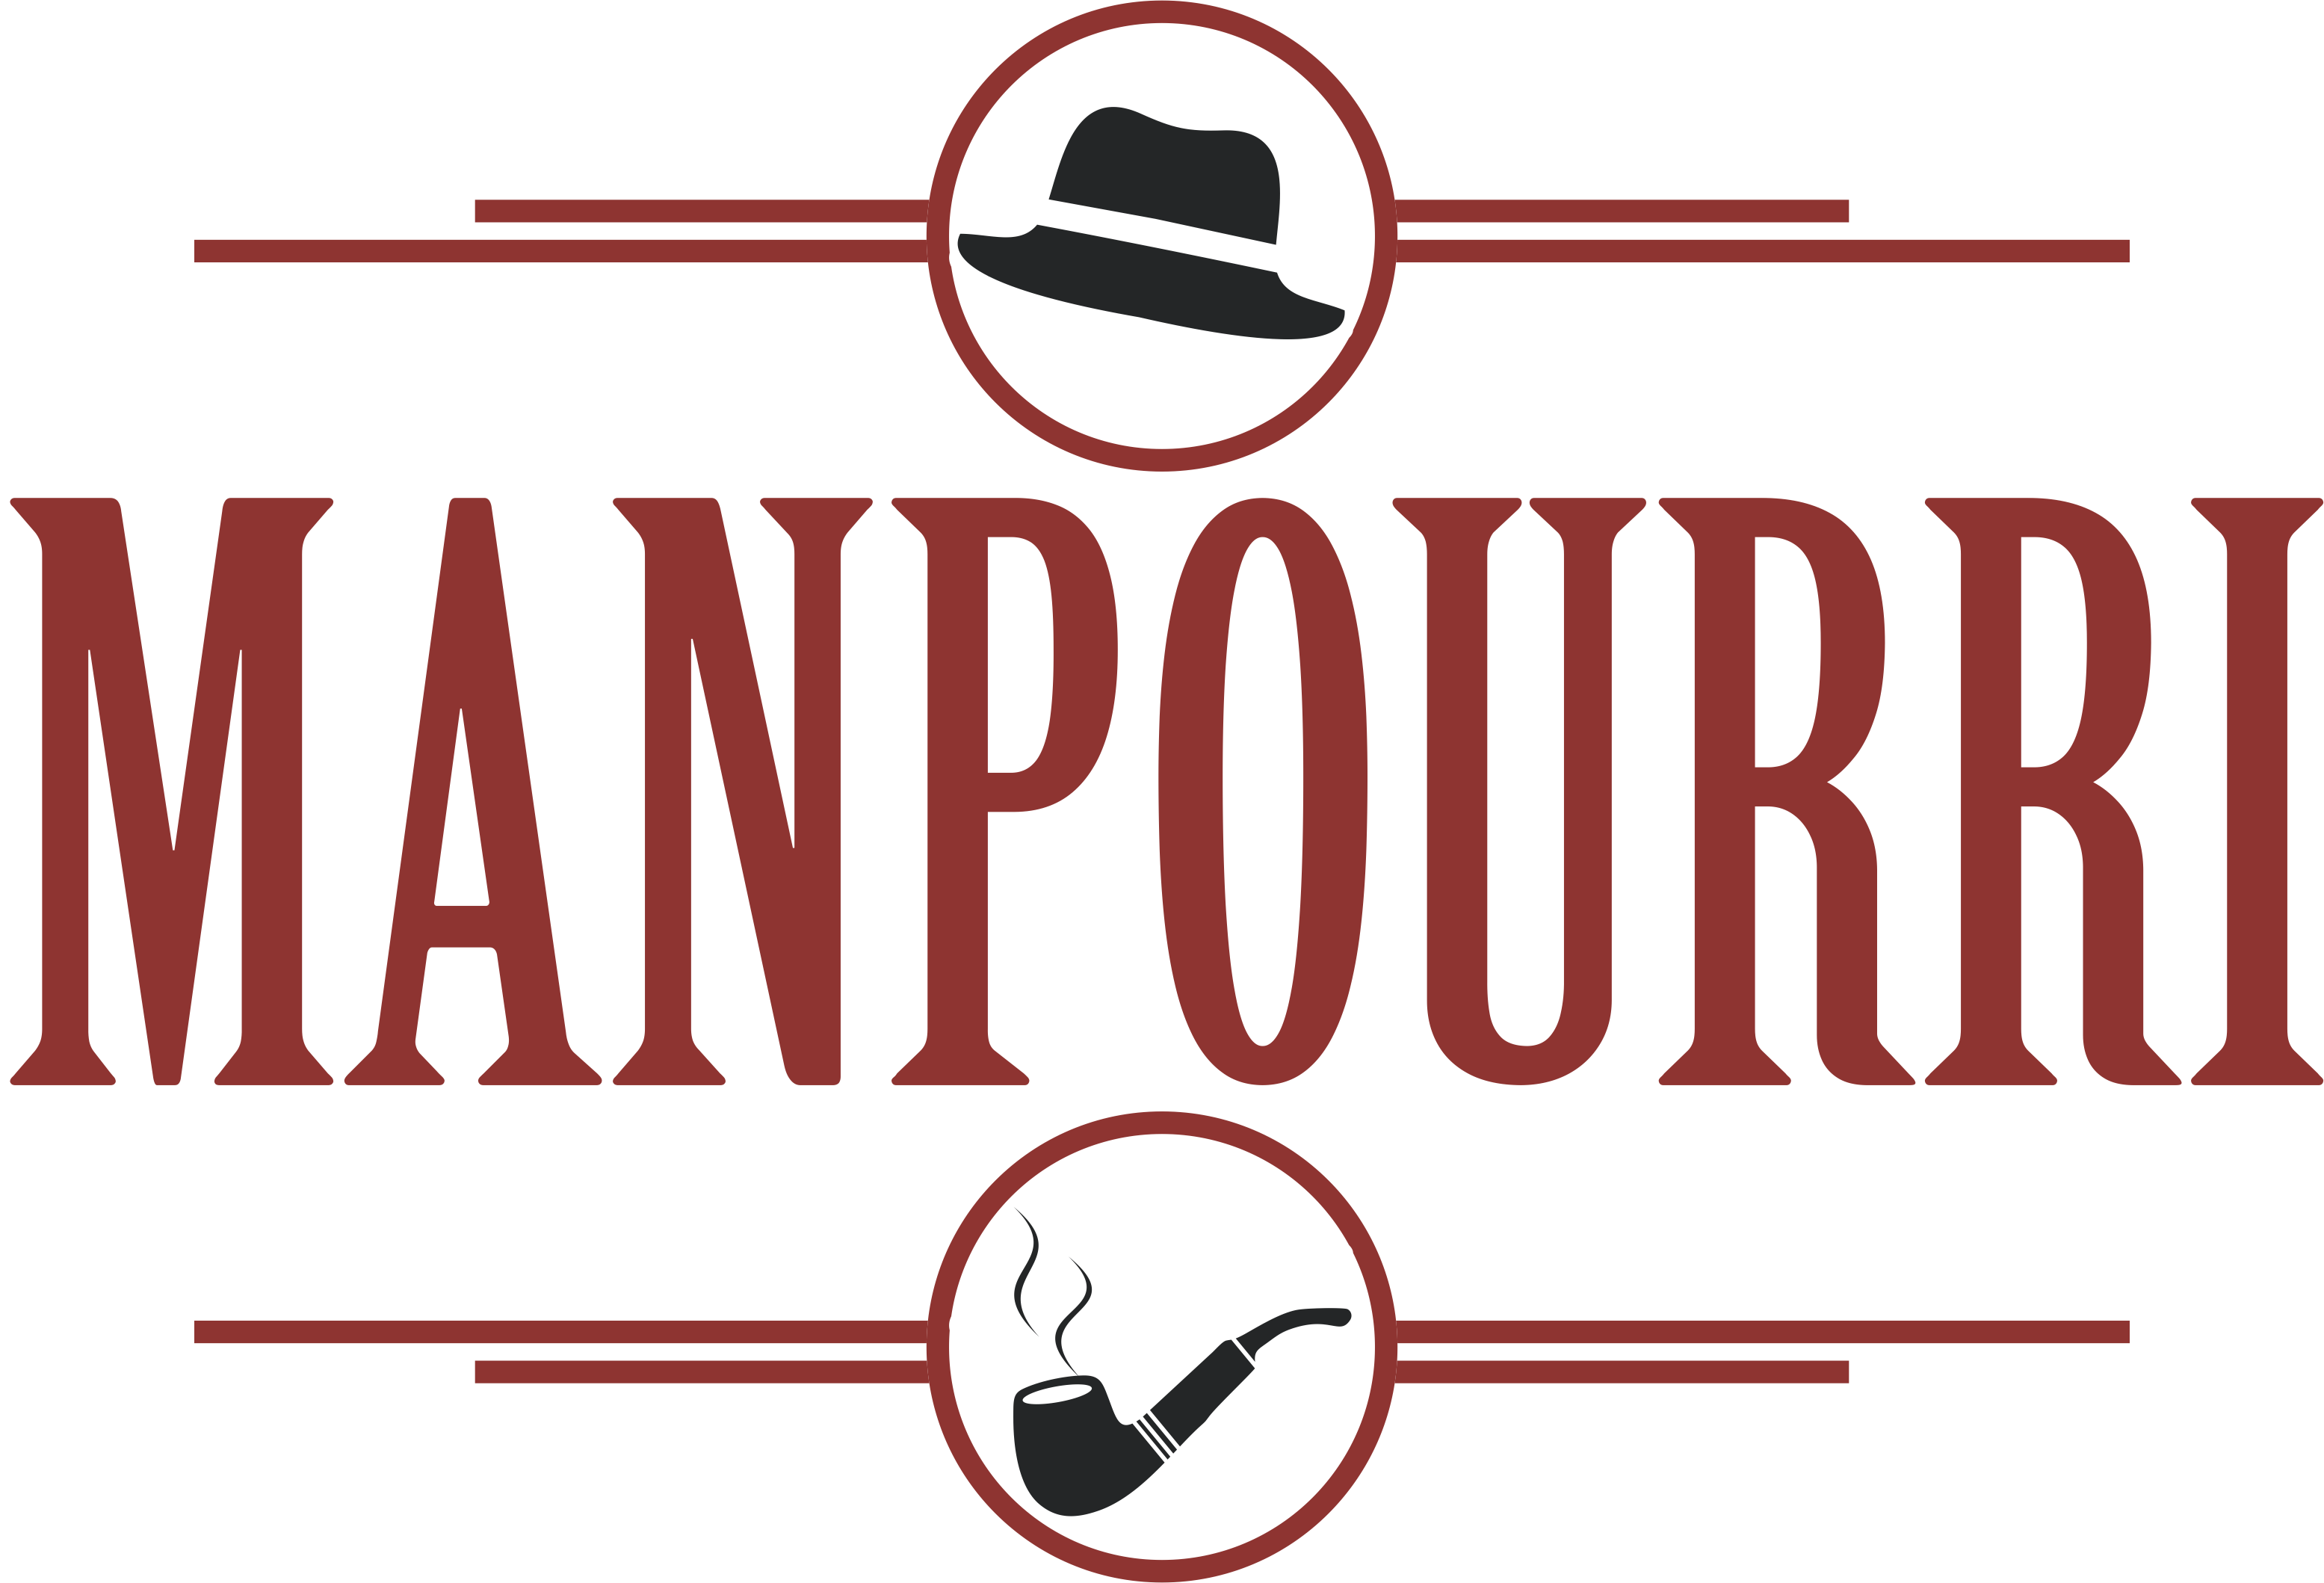 Create a logo for ManPourri. Just like it sounds, it's potpourri for men